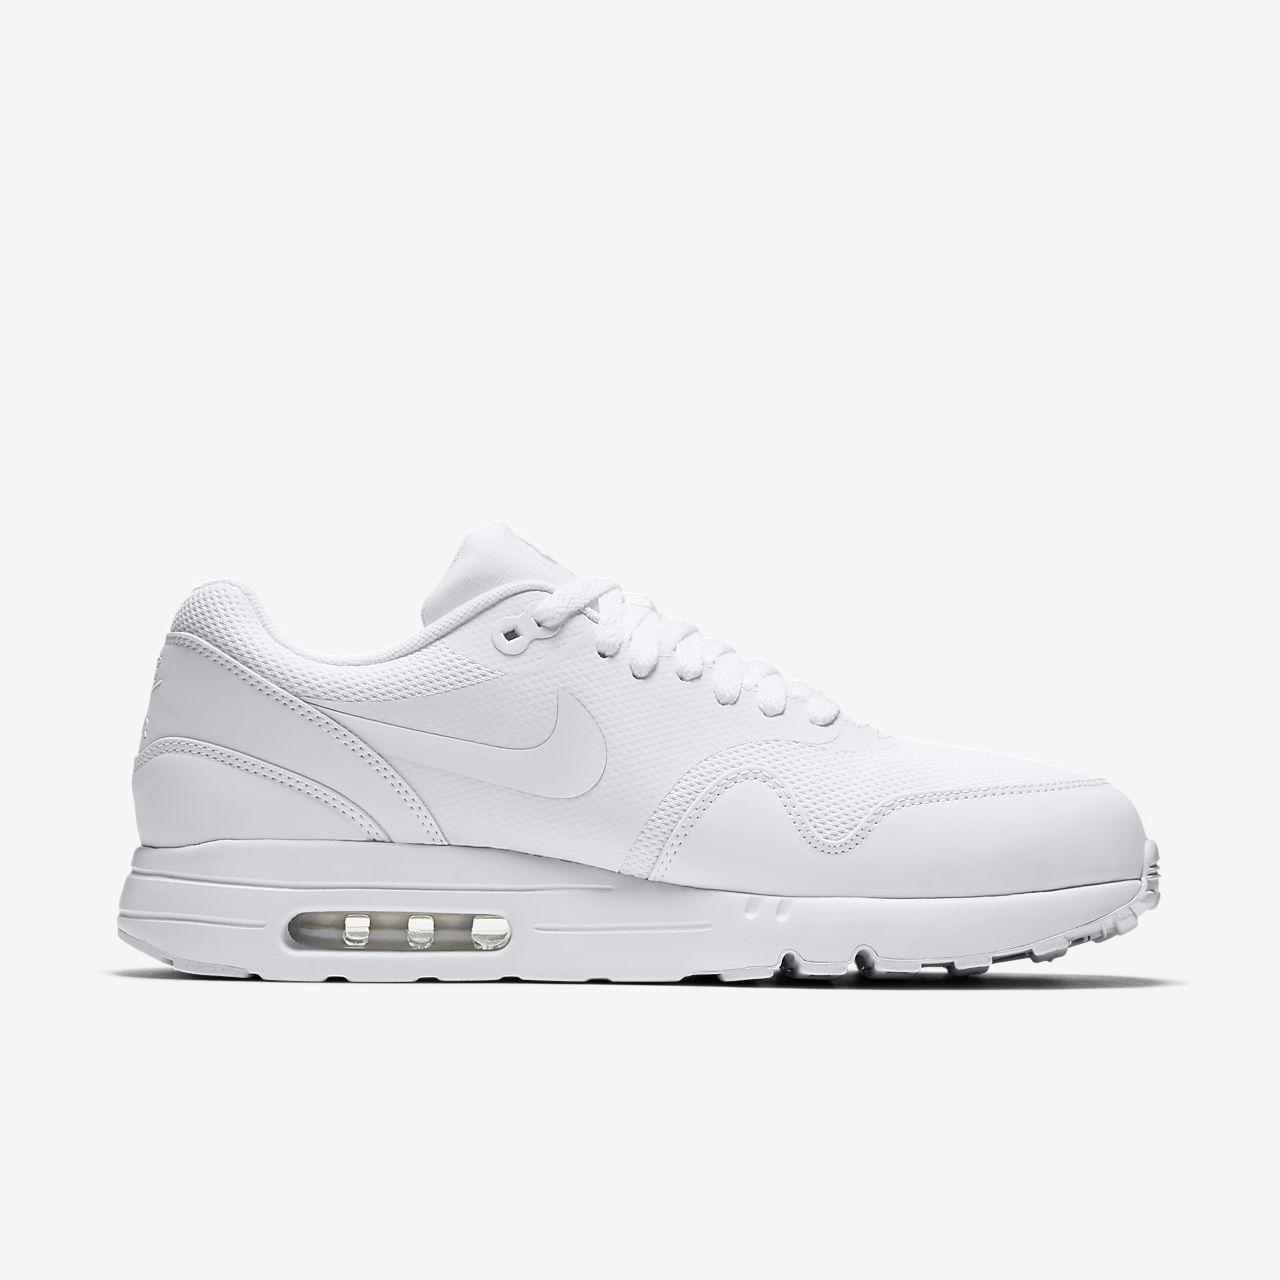 6488d6a330461 Nike Air Max 1 Ultra 2.0 Essential Men s Shoe - 10.5